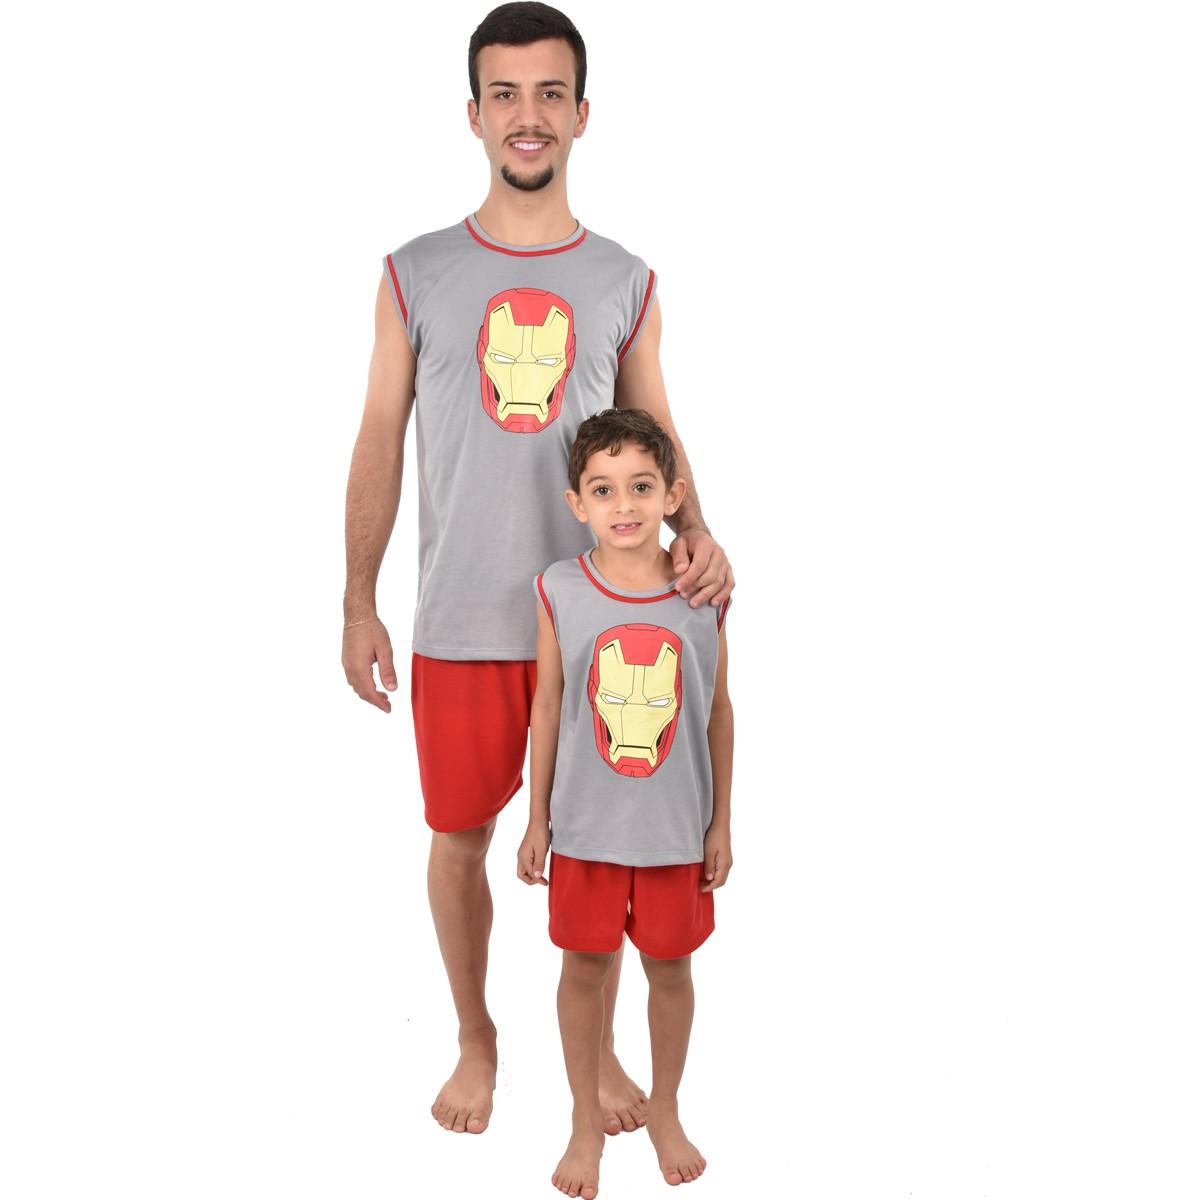 Pijama Regata Short Masculino Infantil Menino Homem de Ferro Vingadores Ref 356